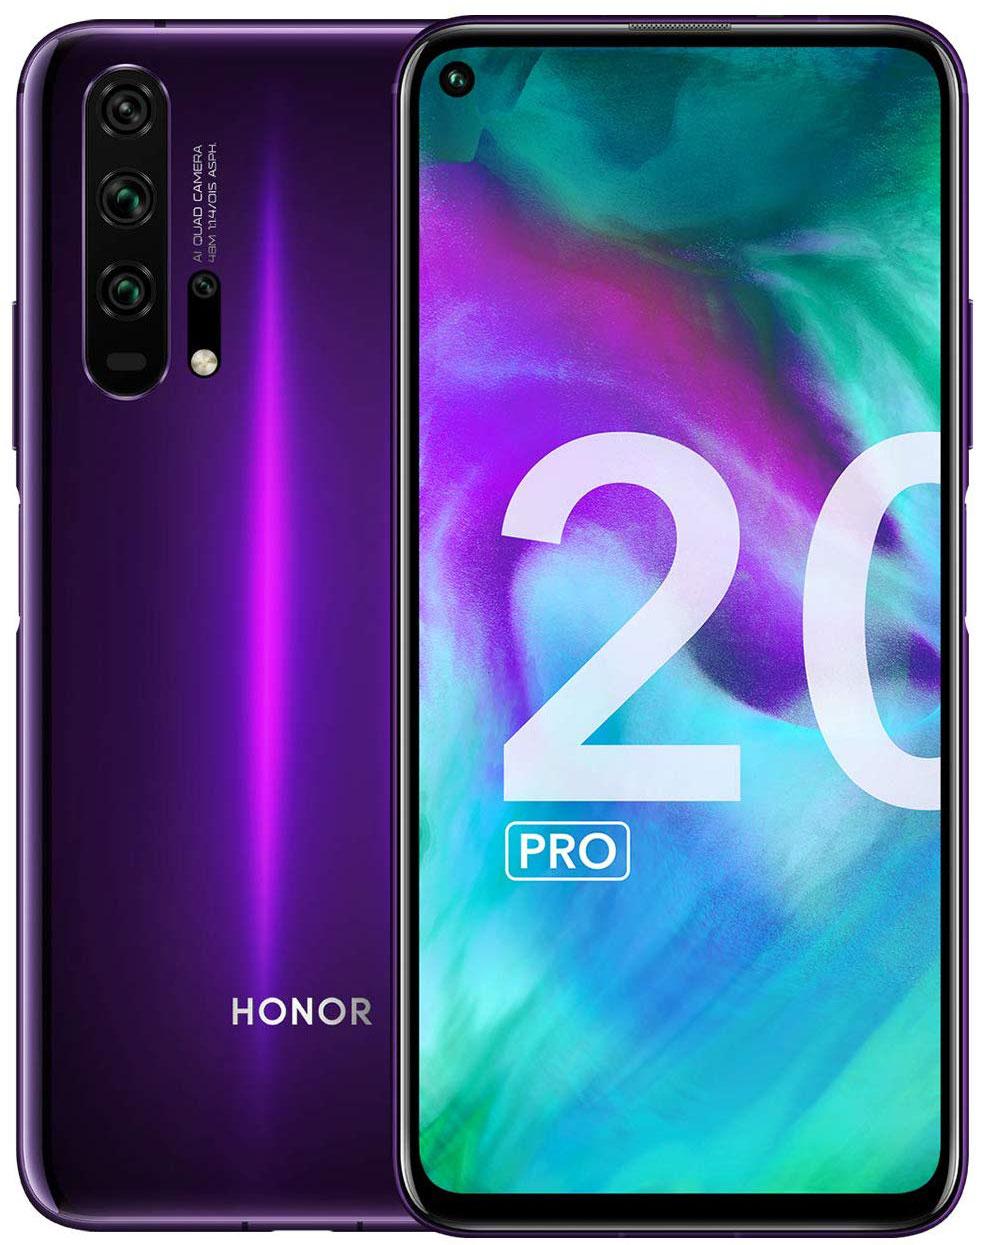 honor-20-pro.jpg